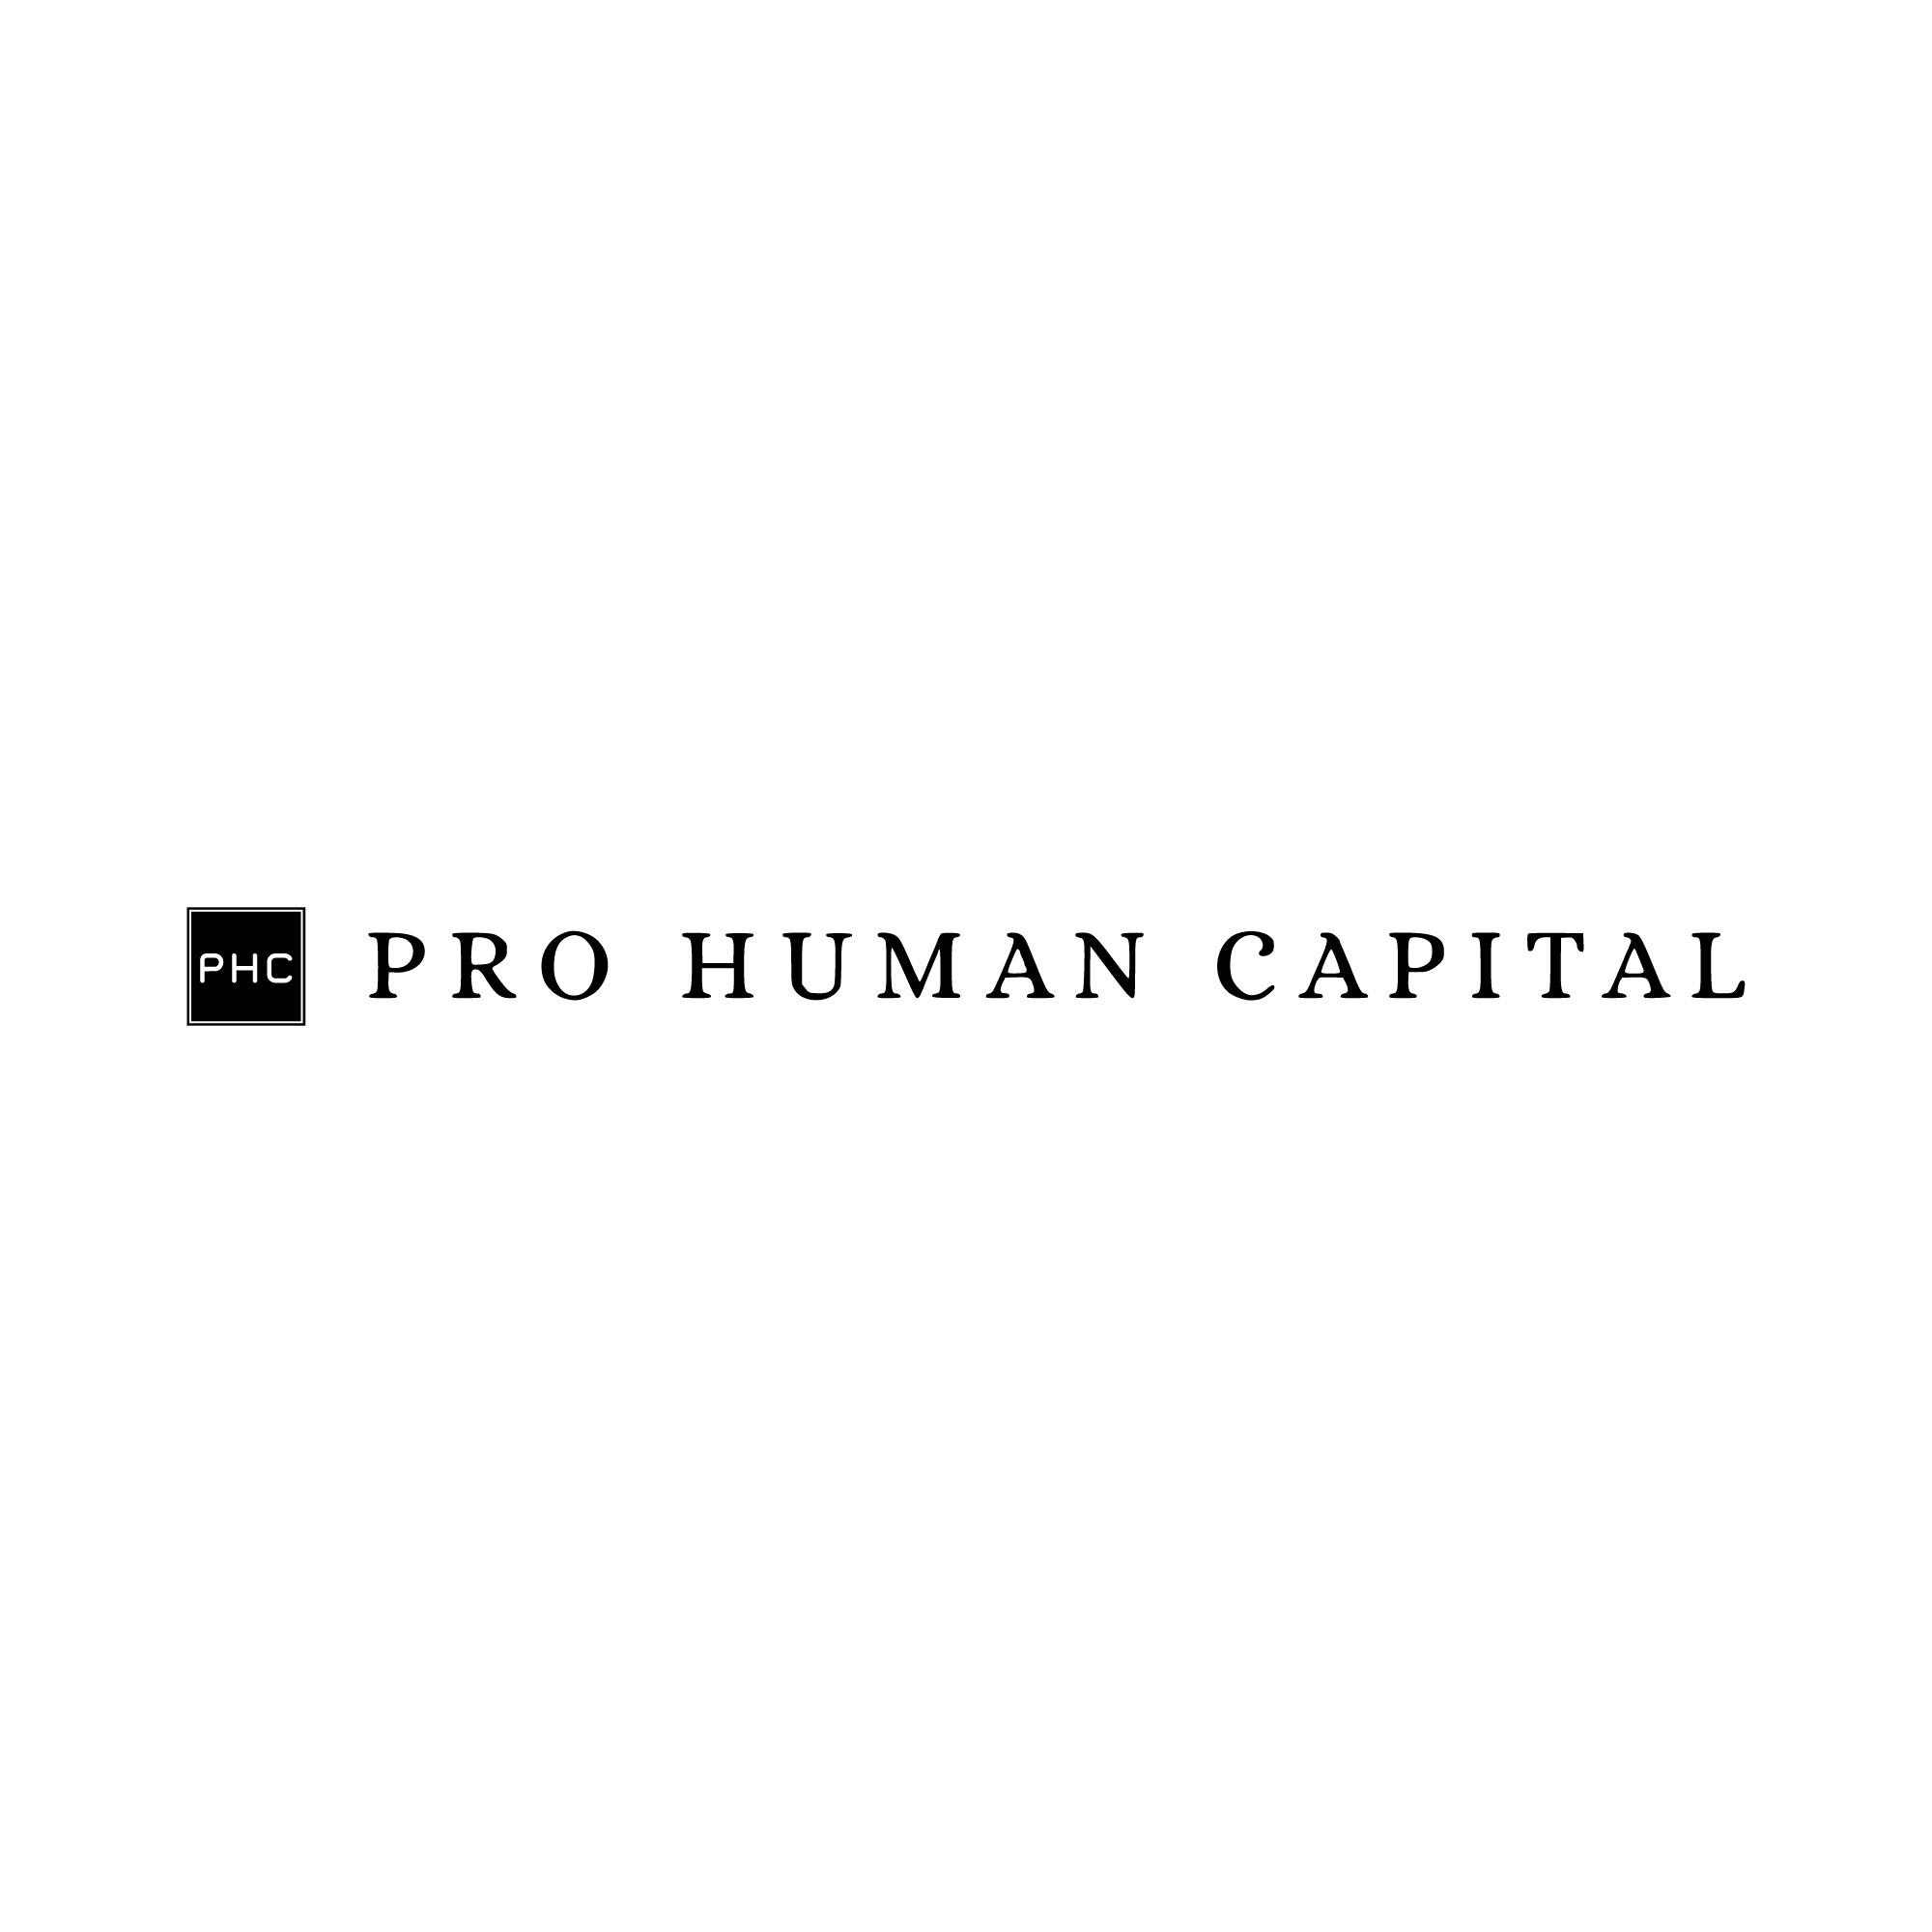 Pro Human Capital